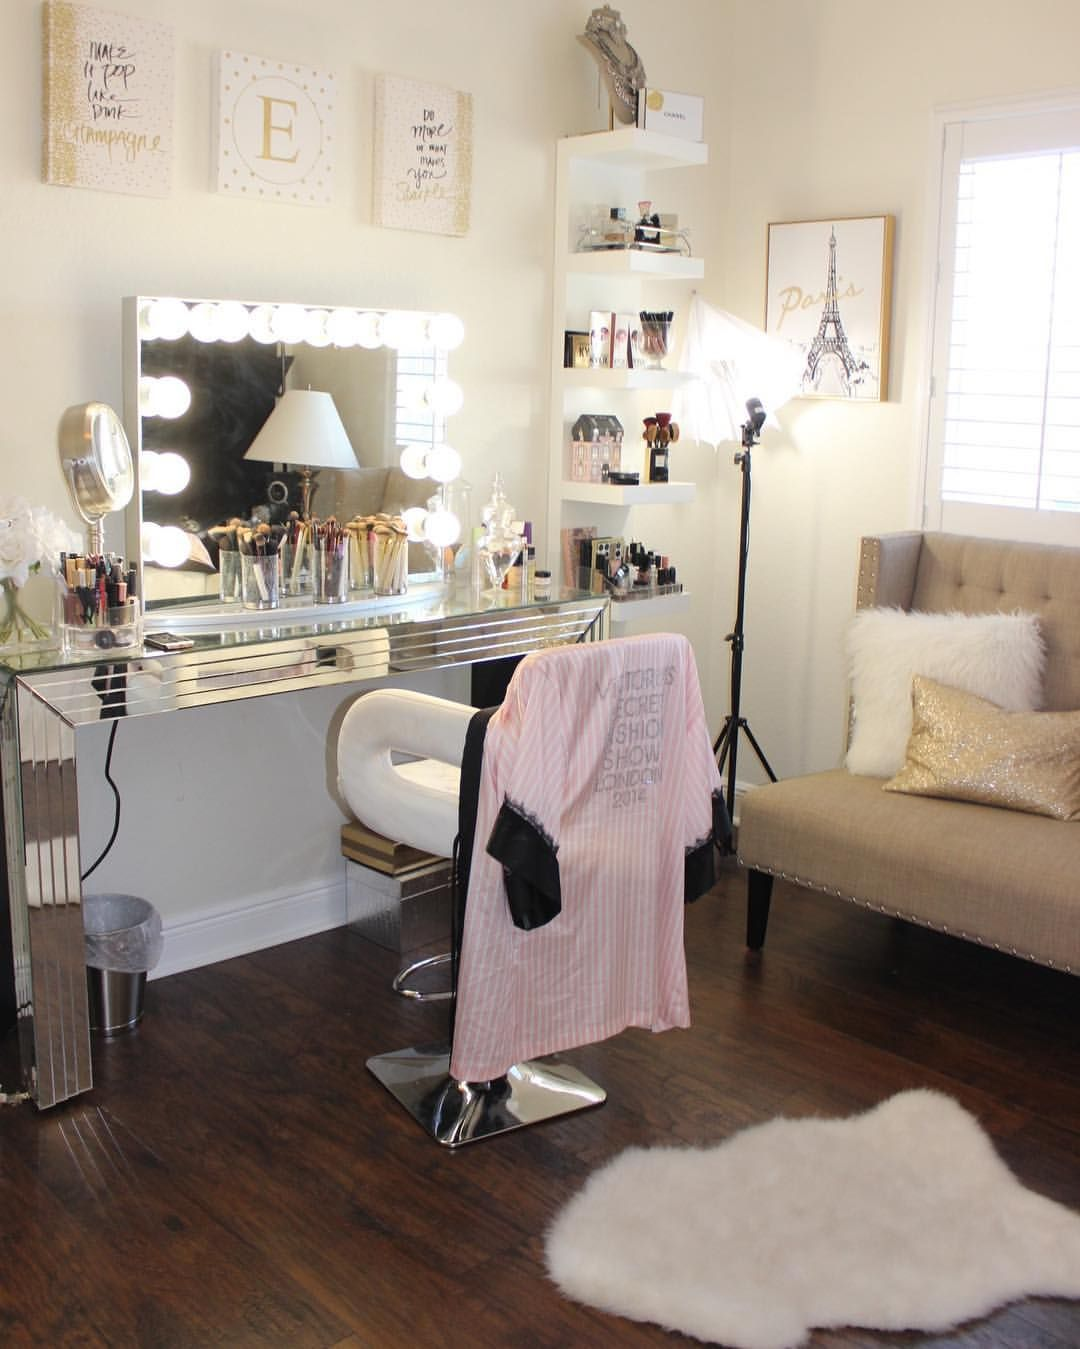 Room Beauty Room Glam Room T